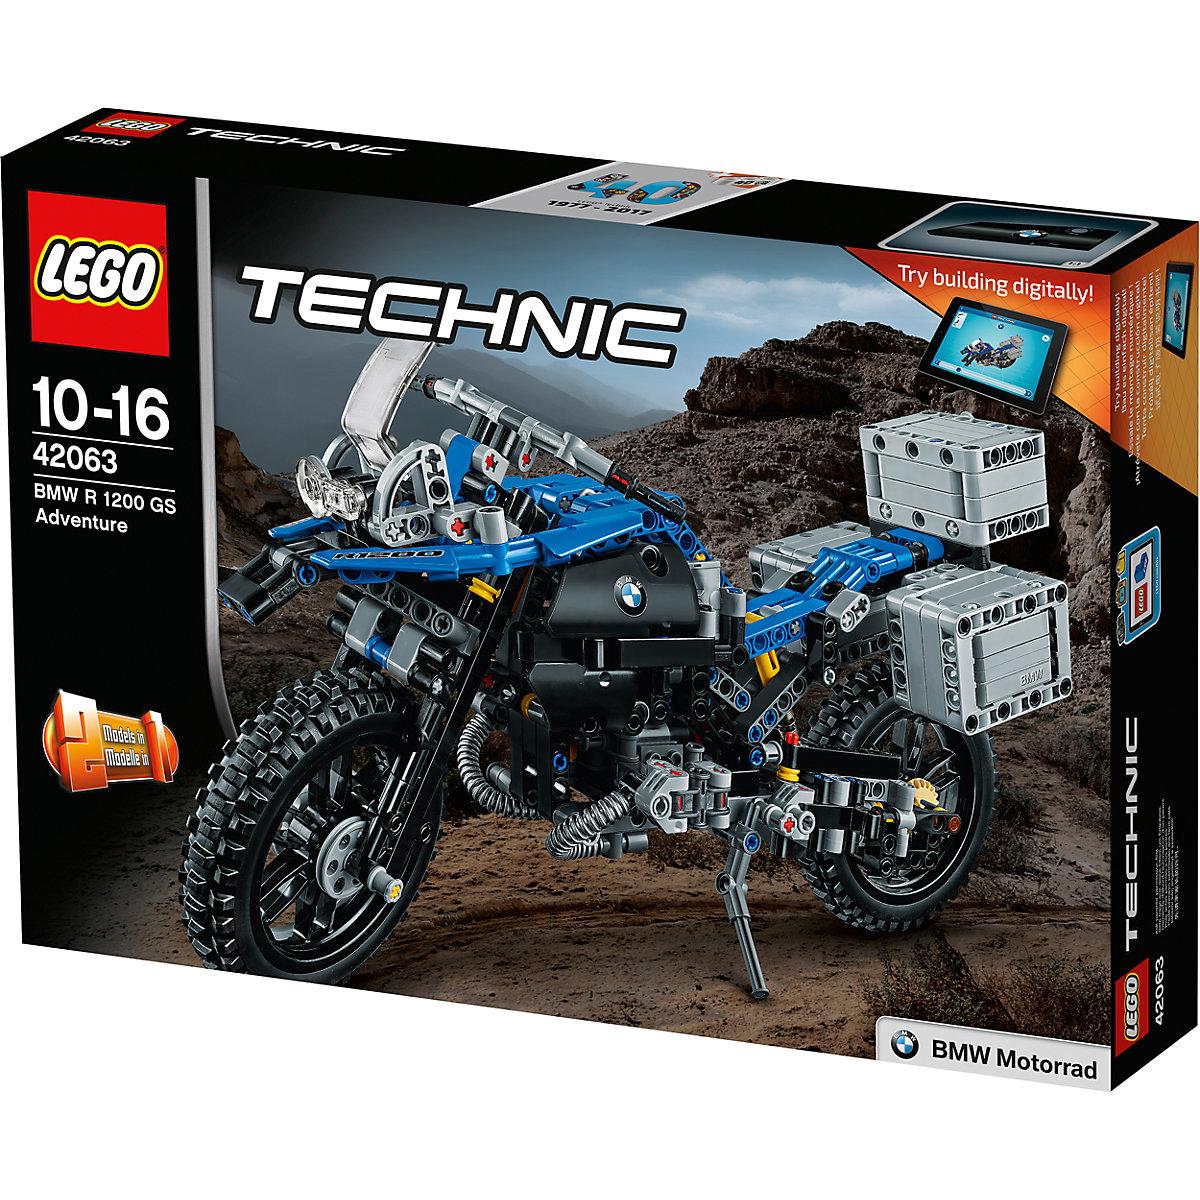 LEGO 42063 Technic: BMW R 1200 GS Adventure, LEGO | myToys